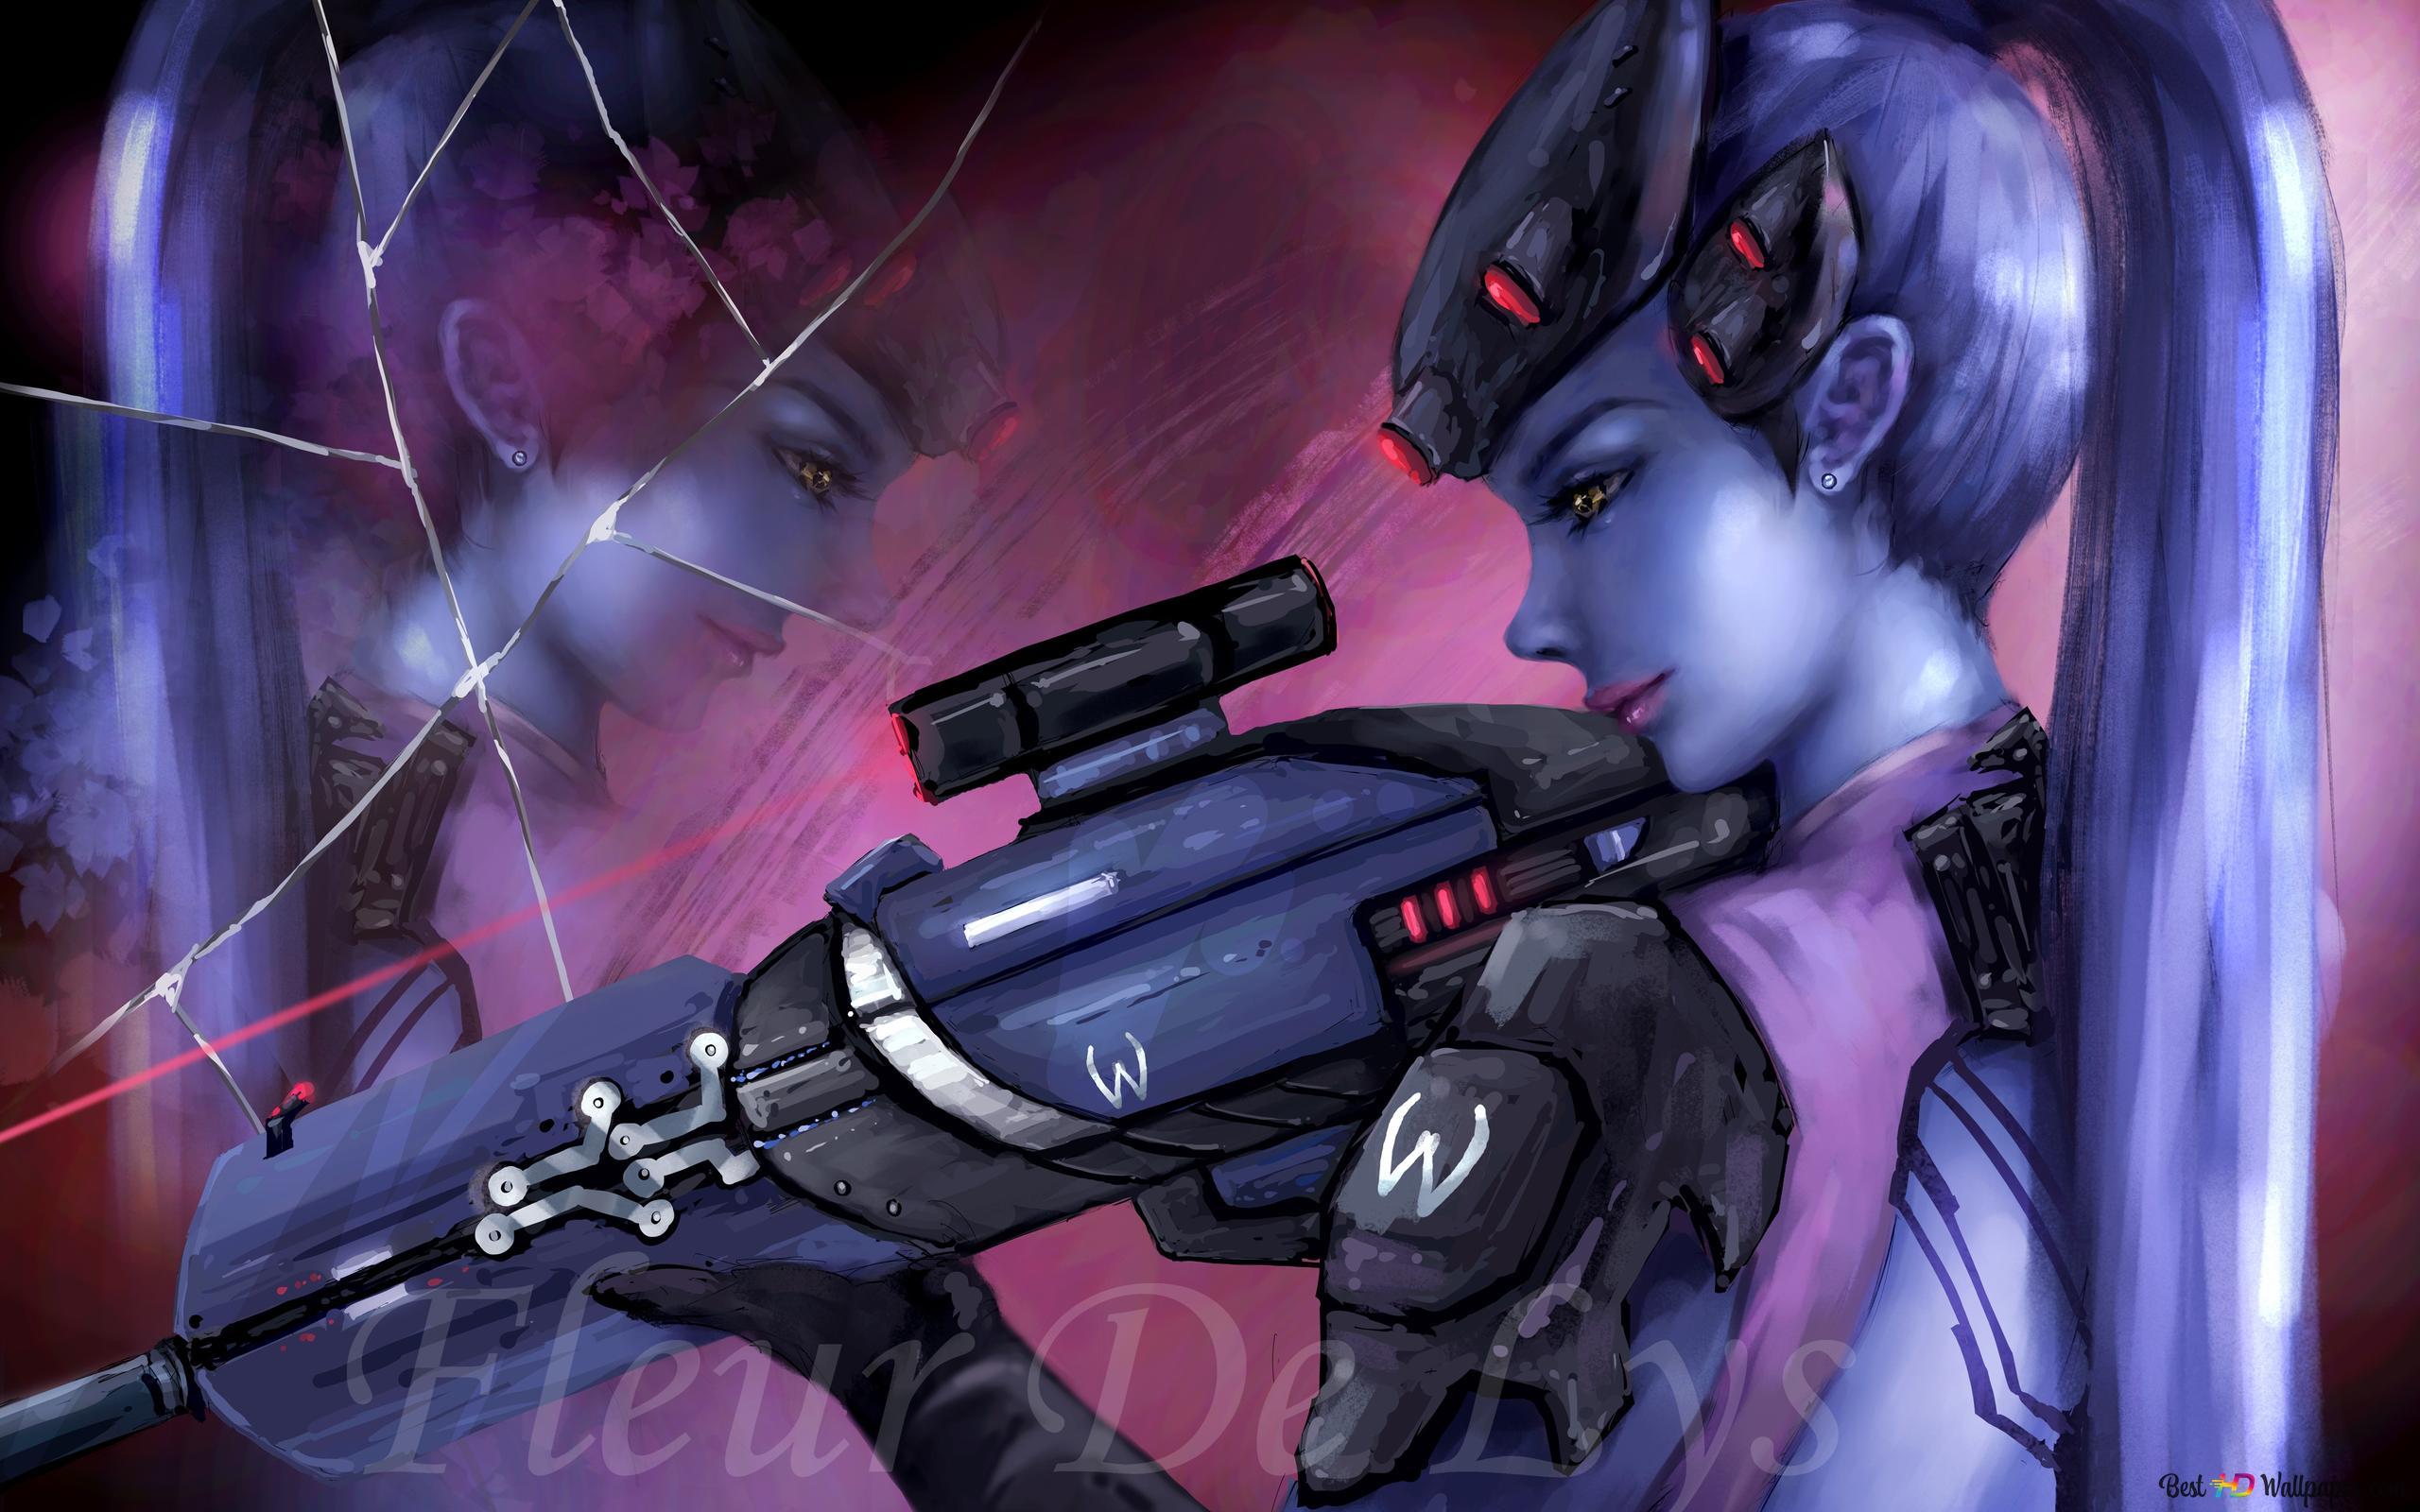 Overwatch Widow Maker Hd Wallpaper Download